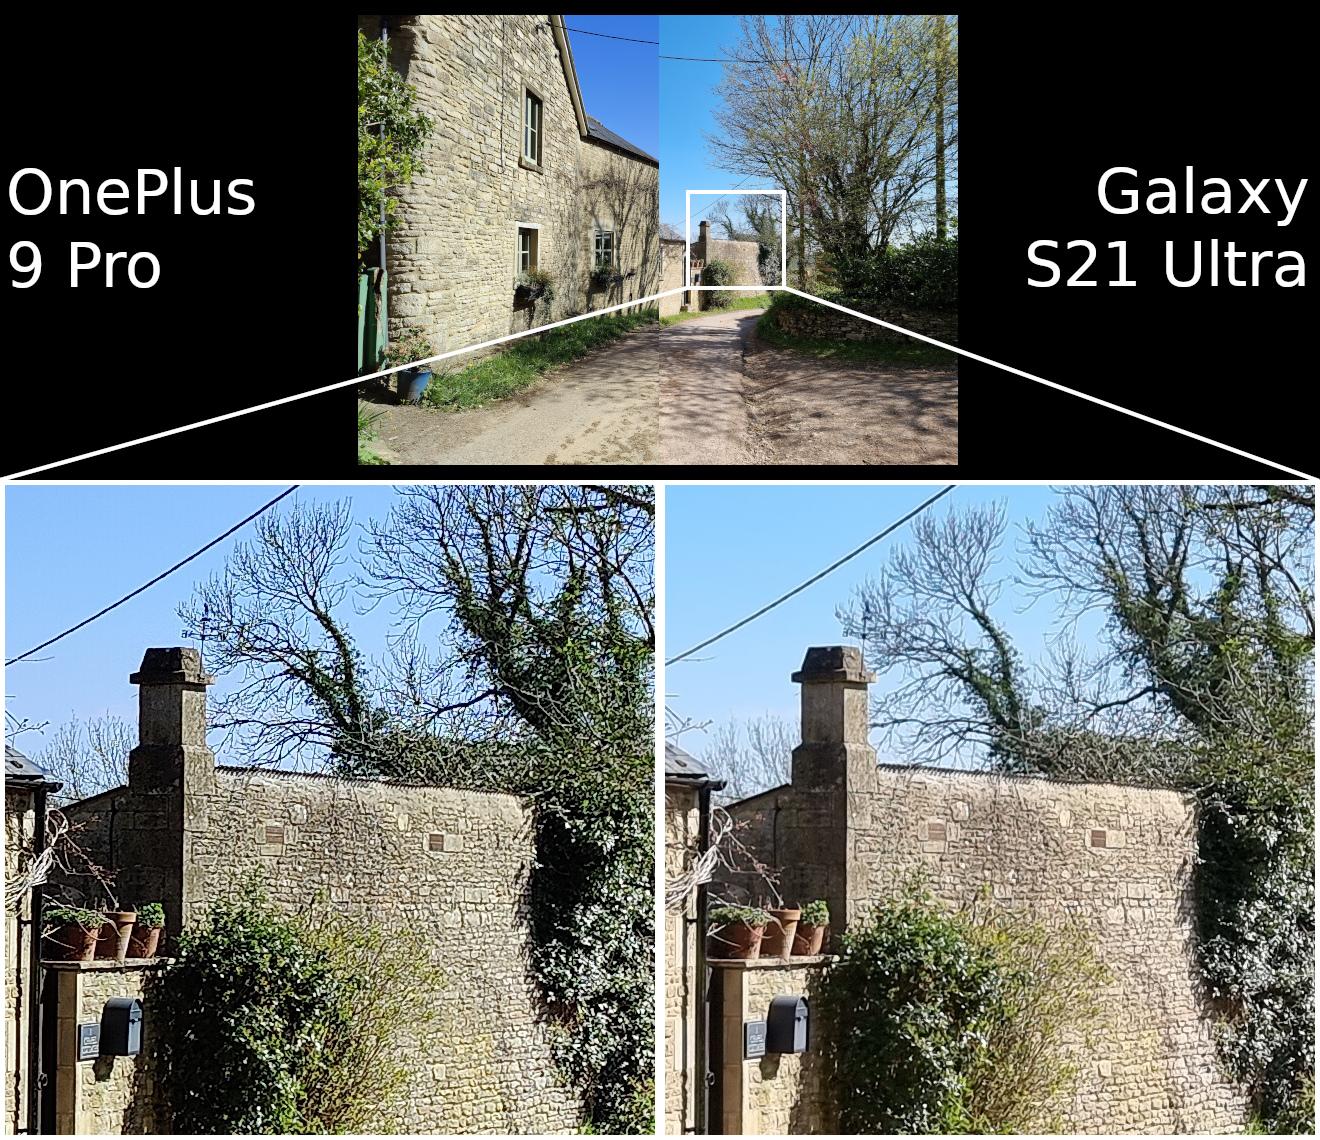 OnePlus 9 Pro vs Samsung Galaxy S21 Ultra camera detail